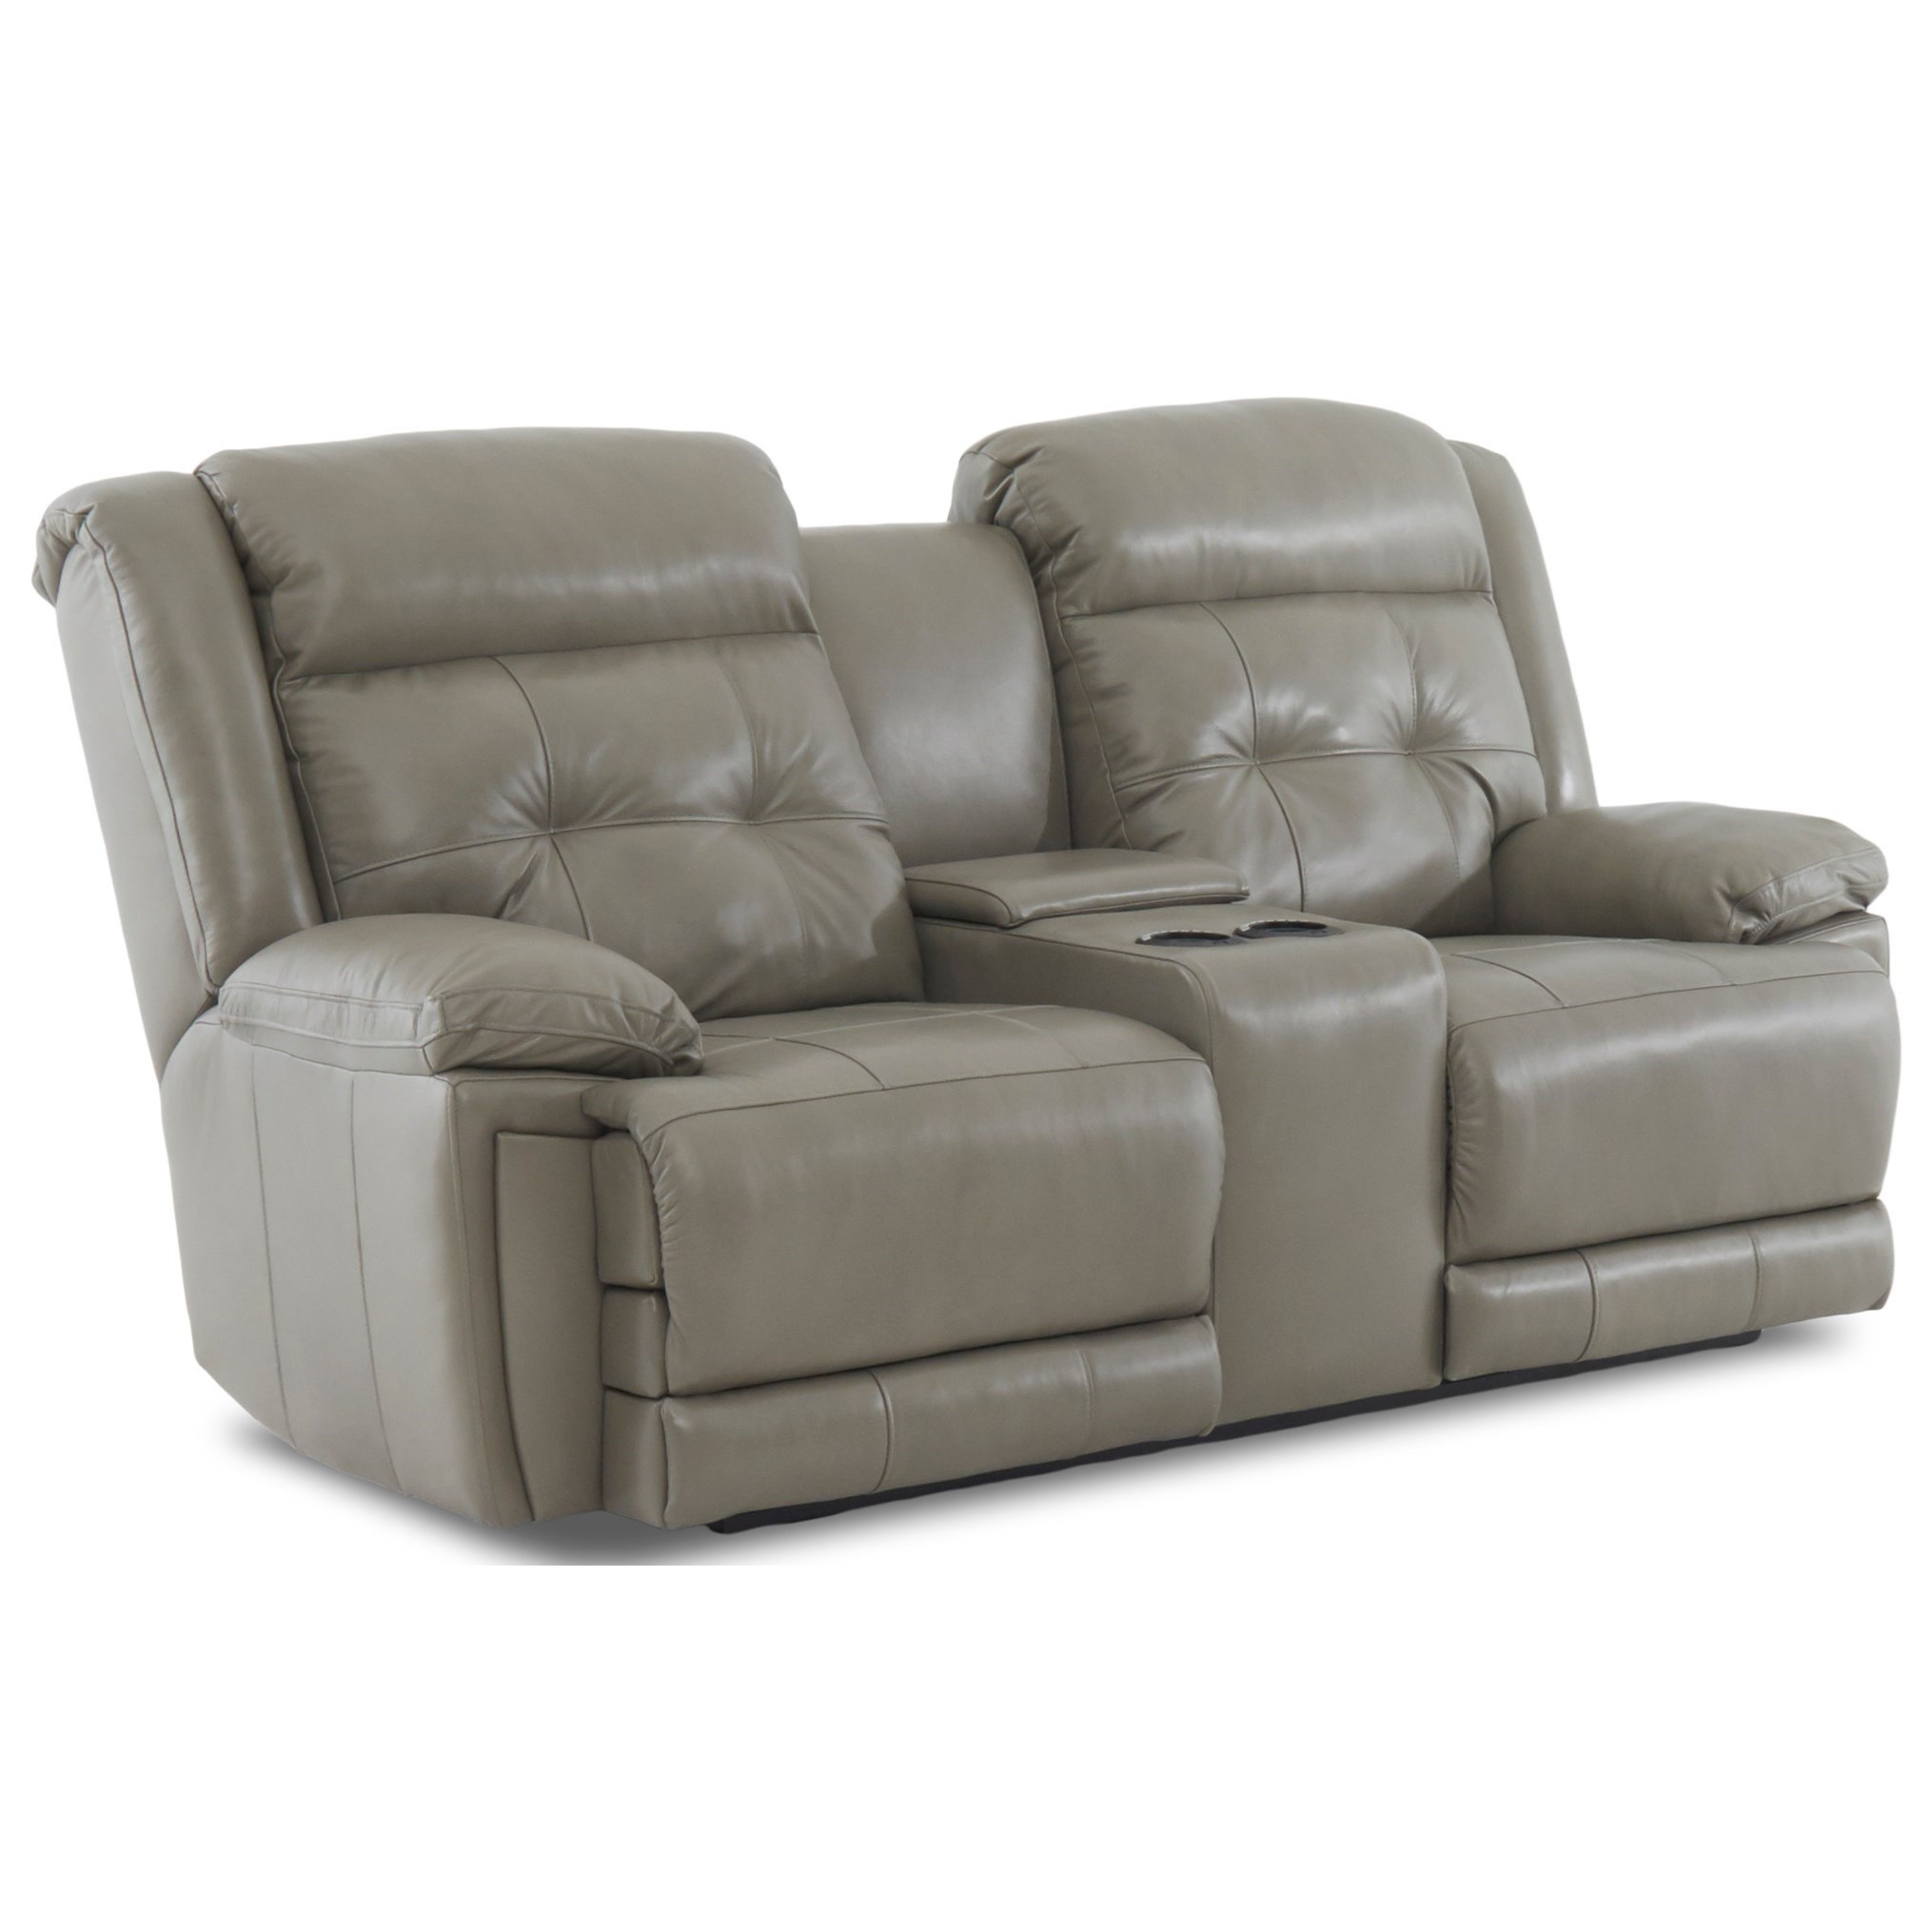 klaussner grand power reclining sofa repairs newport gwent mccall casual console loveseat